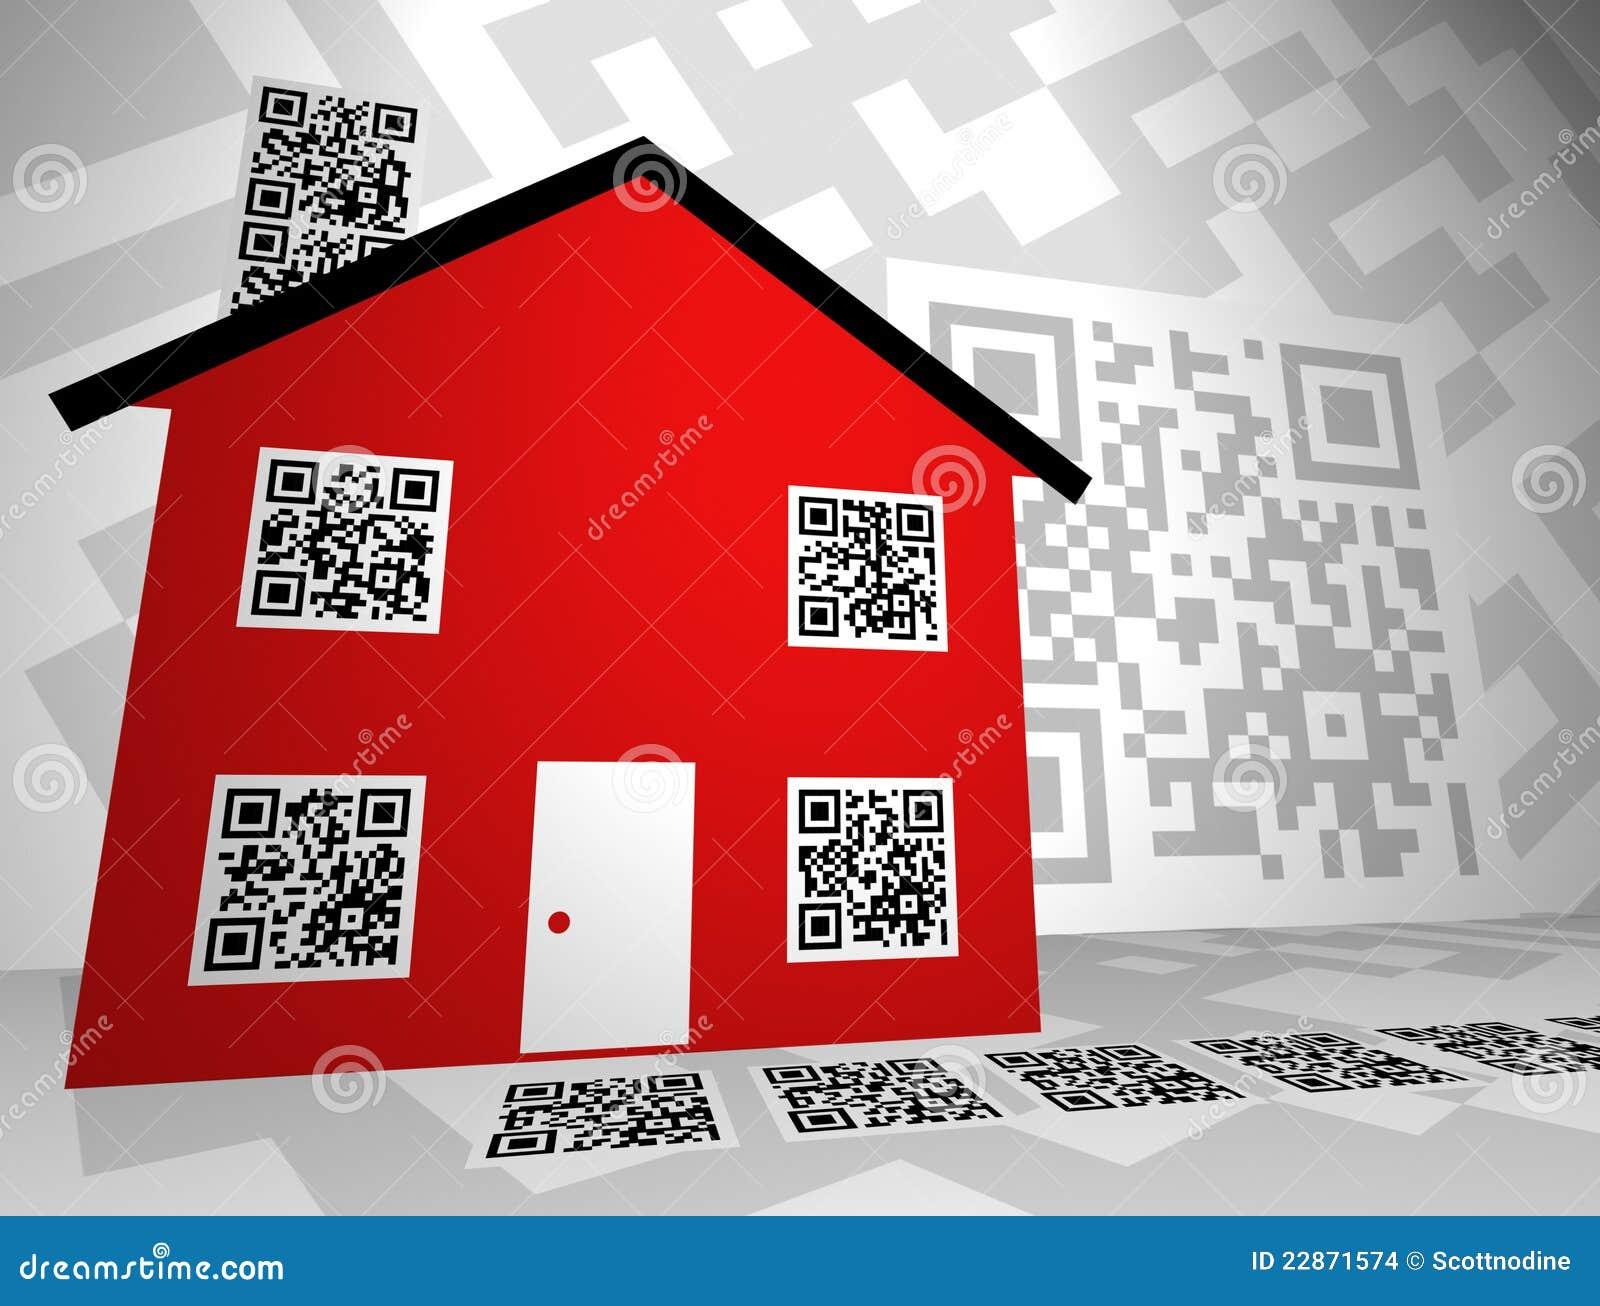 Real Estate Themed QR Codes Concept Design